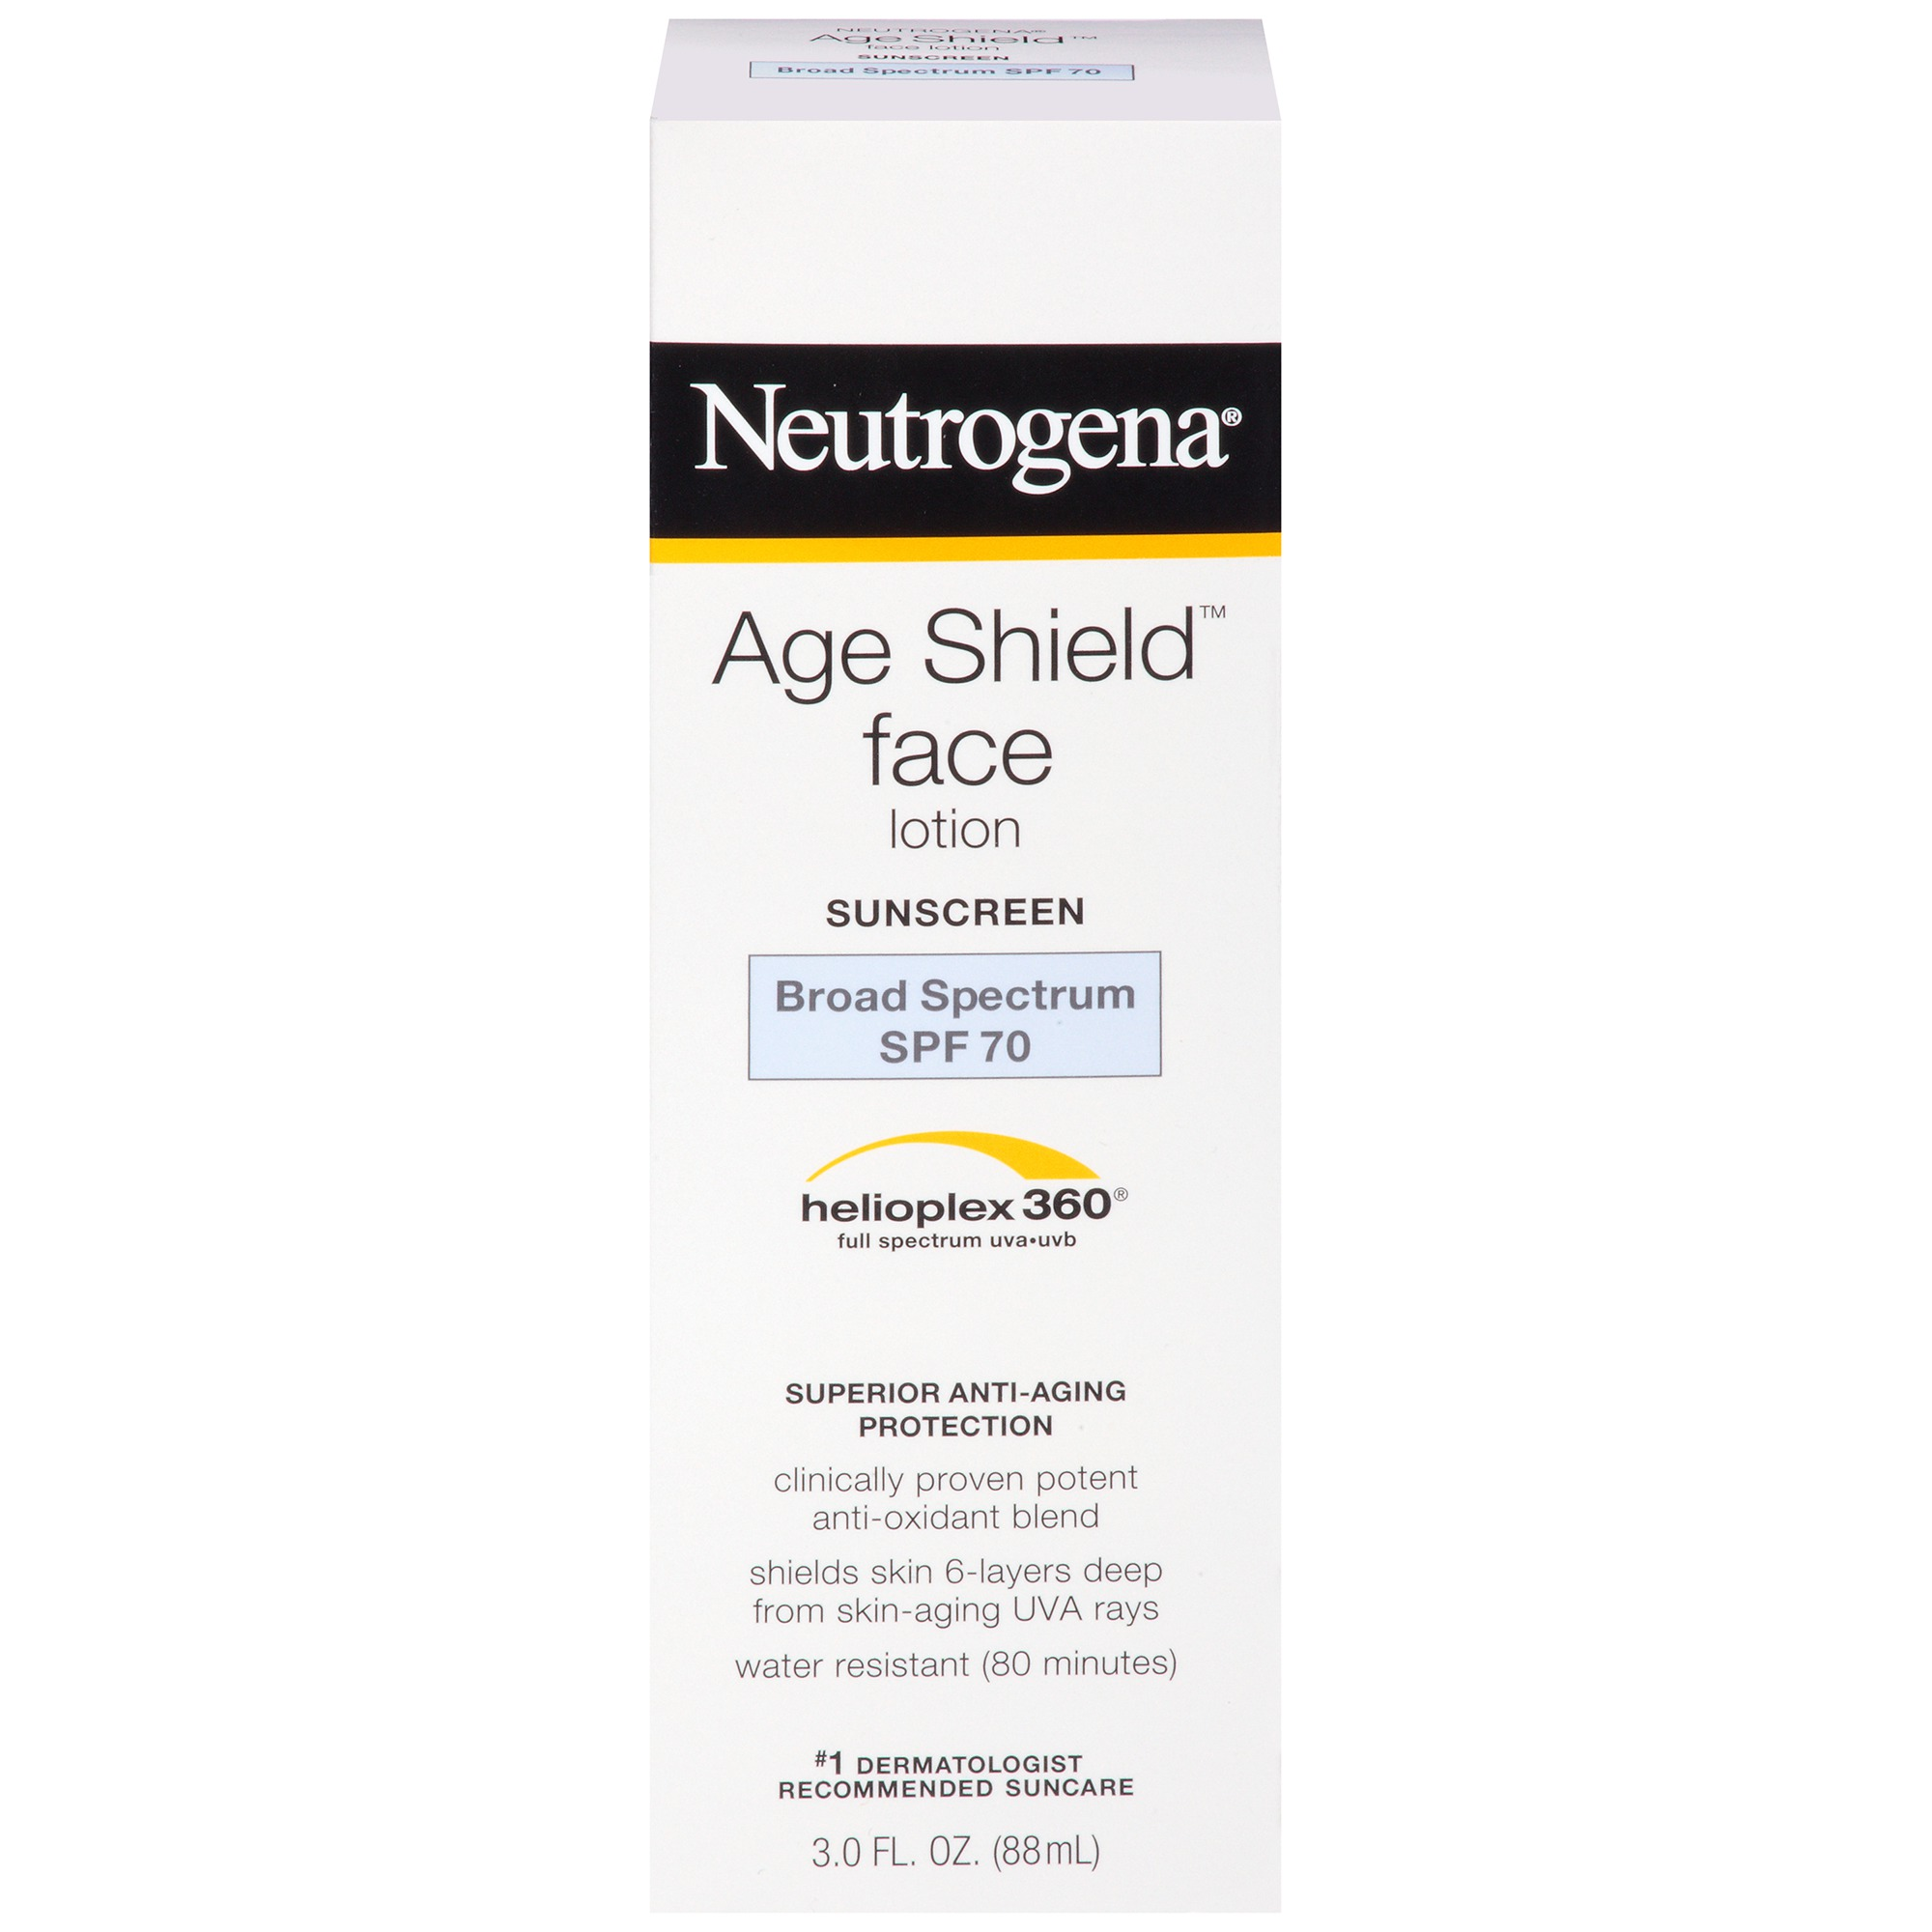 Neutrogena Age Shield Anti-Oxidant Face Lotion Sunscreen, Broad Spectrum Spf 70, Oil-Free Sunscreen, Travel Size 3 Fl. Oz.